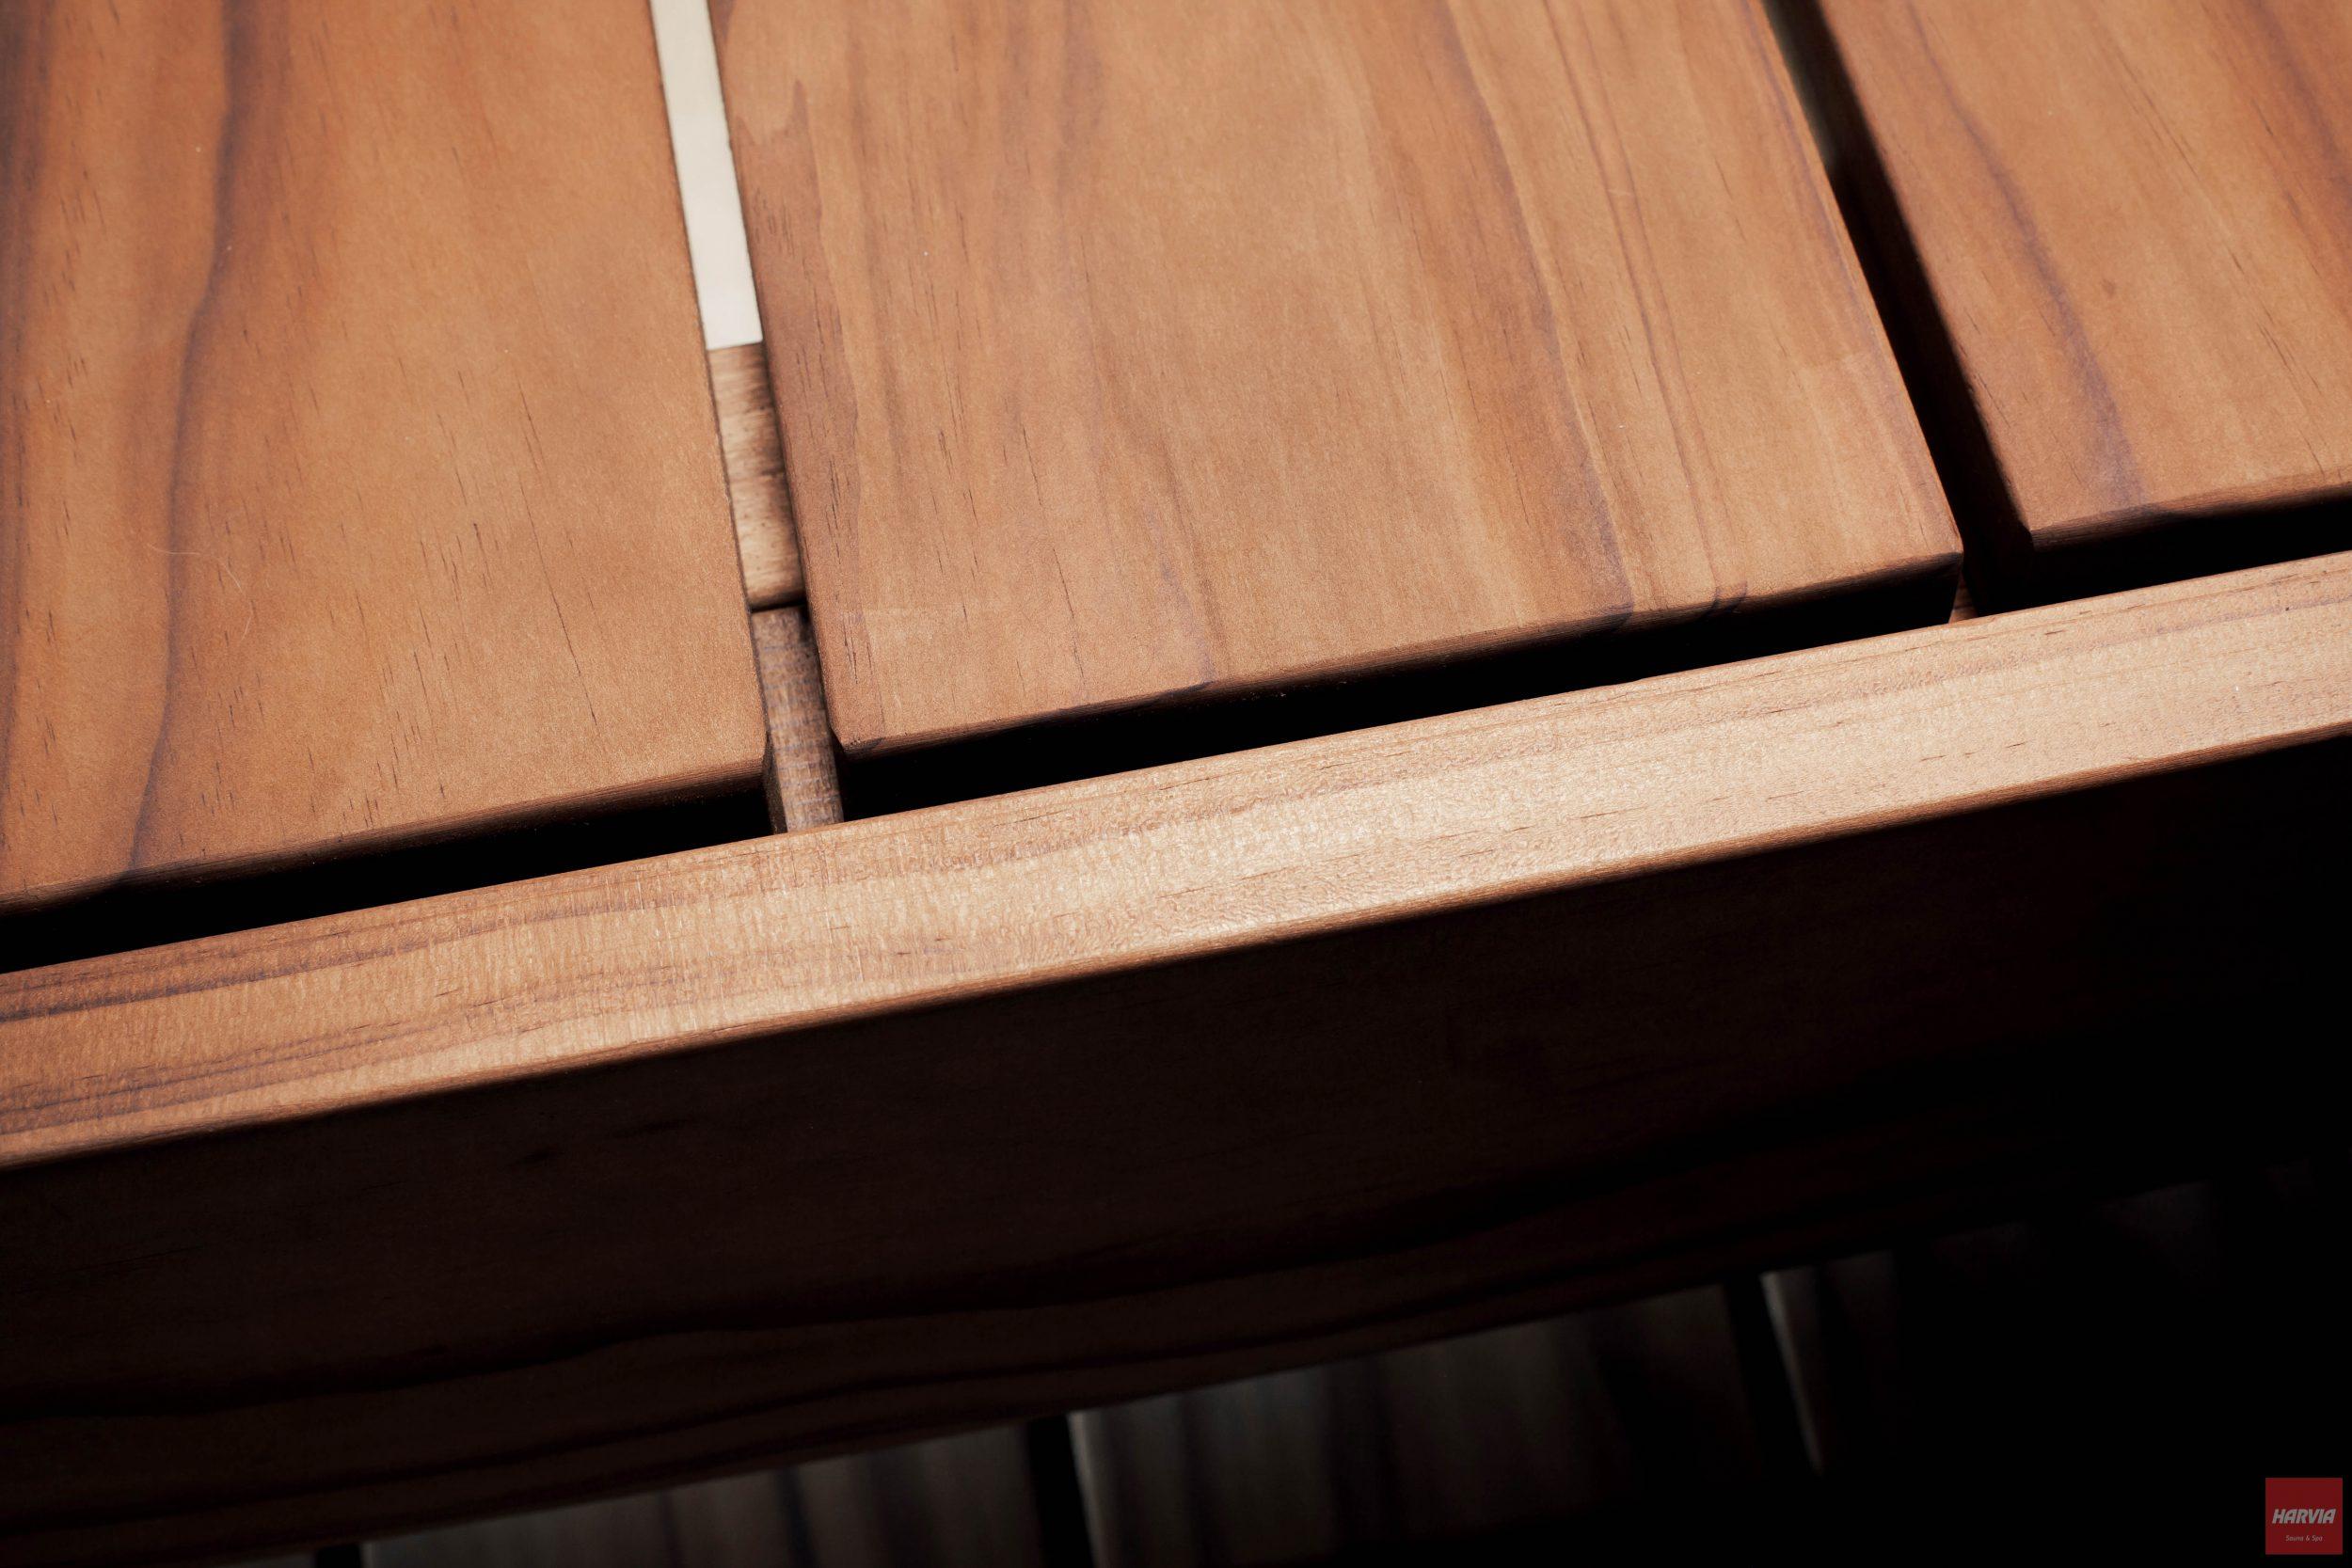 Harvia Radiata pine sauna benches